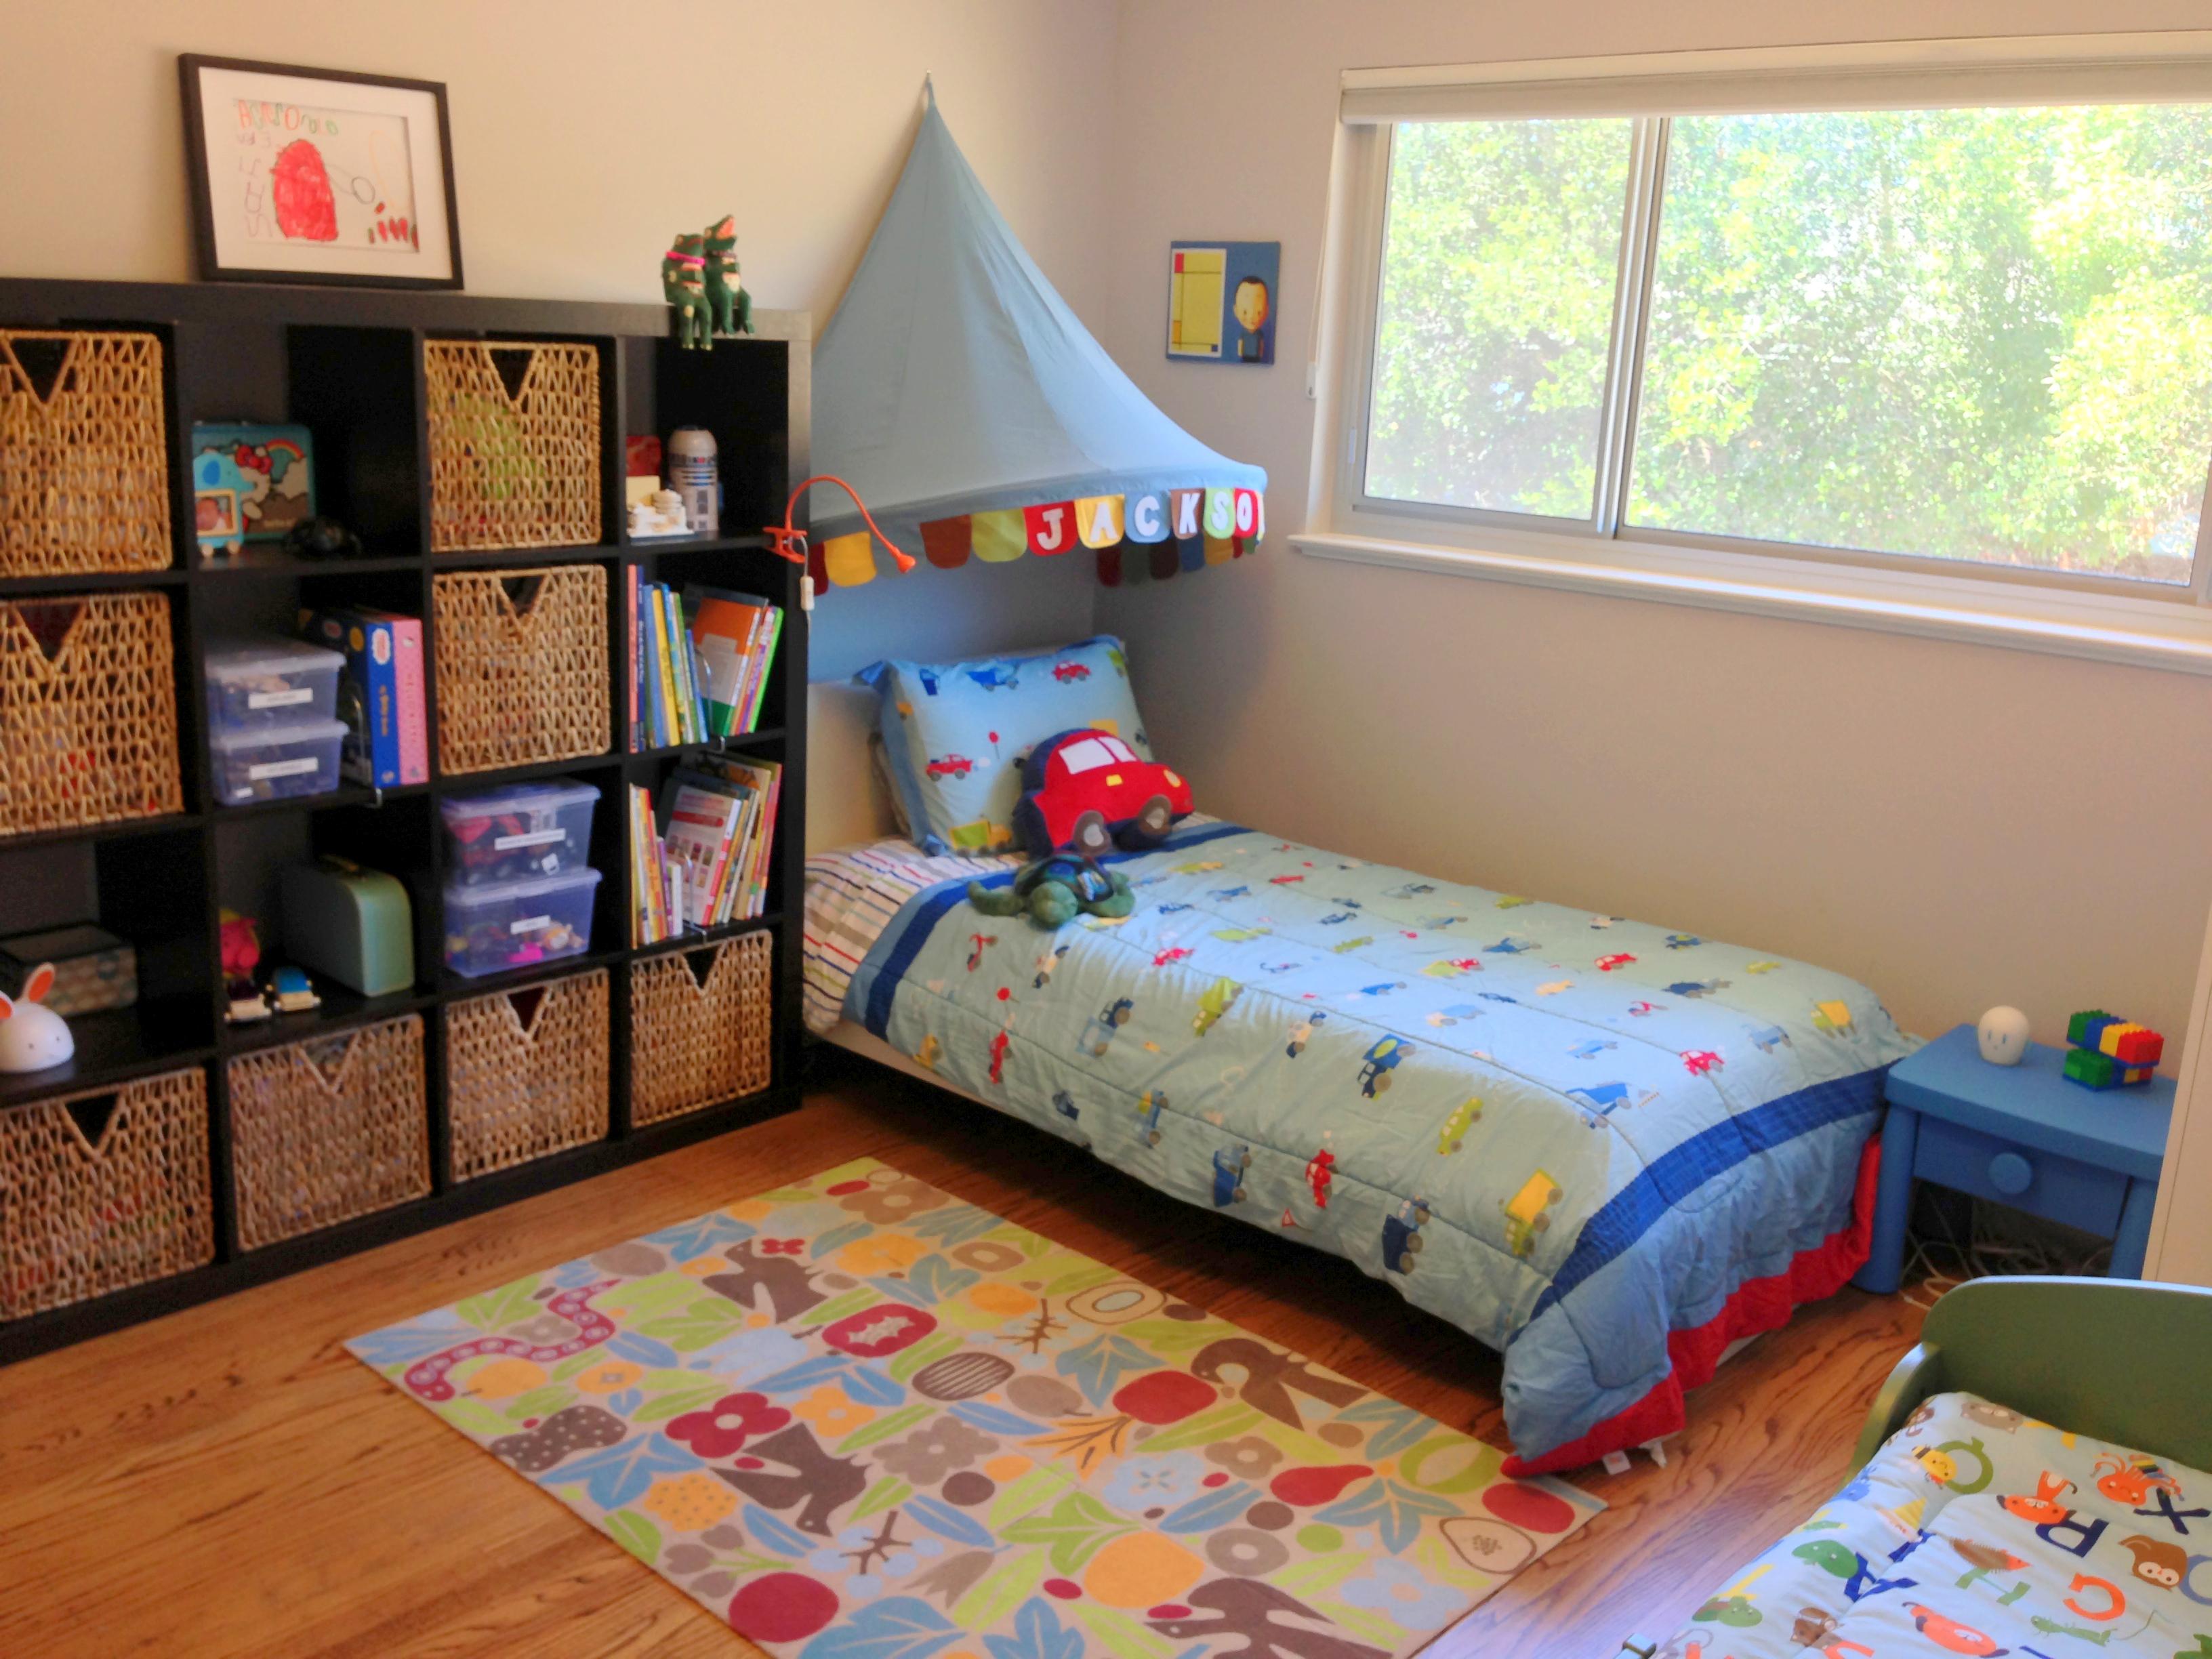 Boy meets girl siblings share a bedroom poche de maman for Sibling bedroom ideas